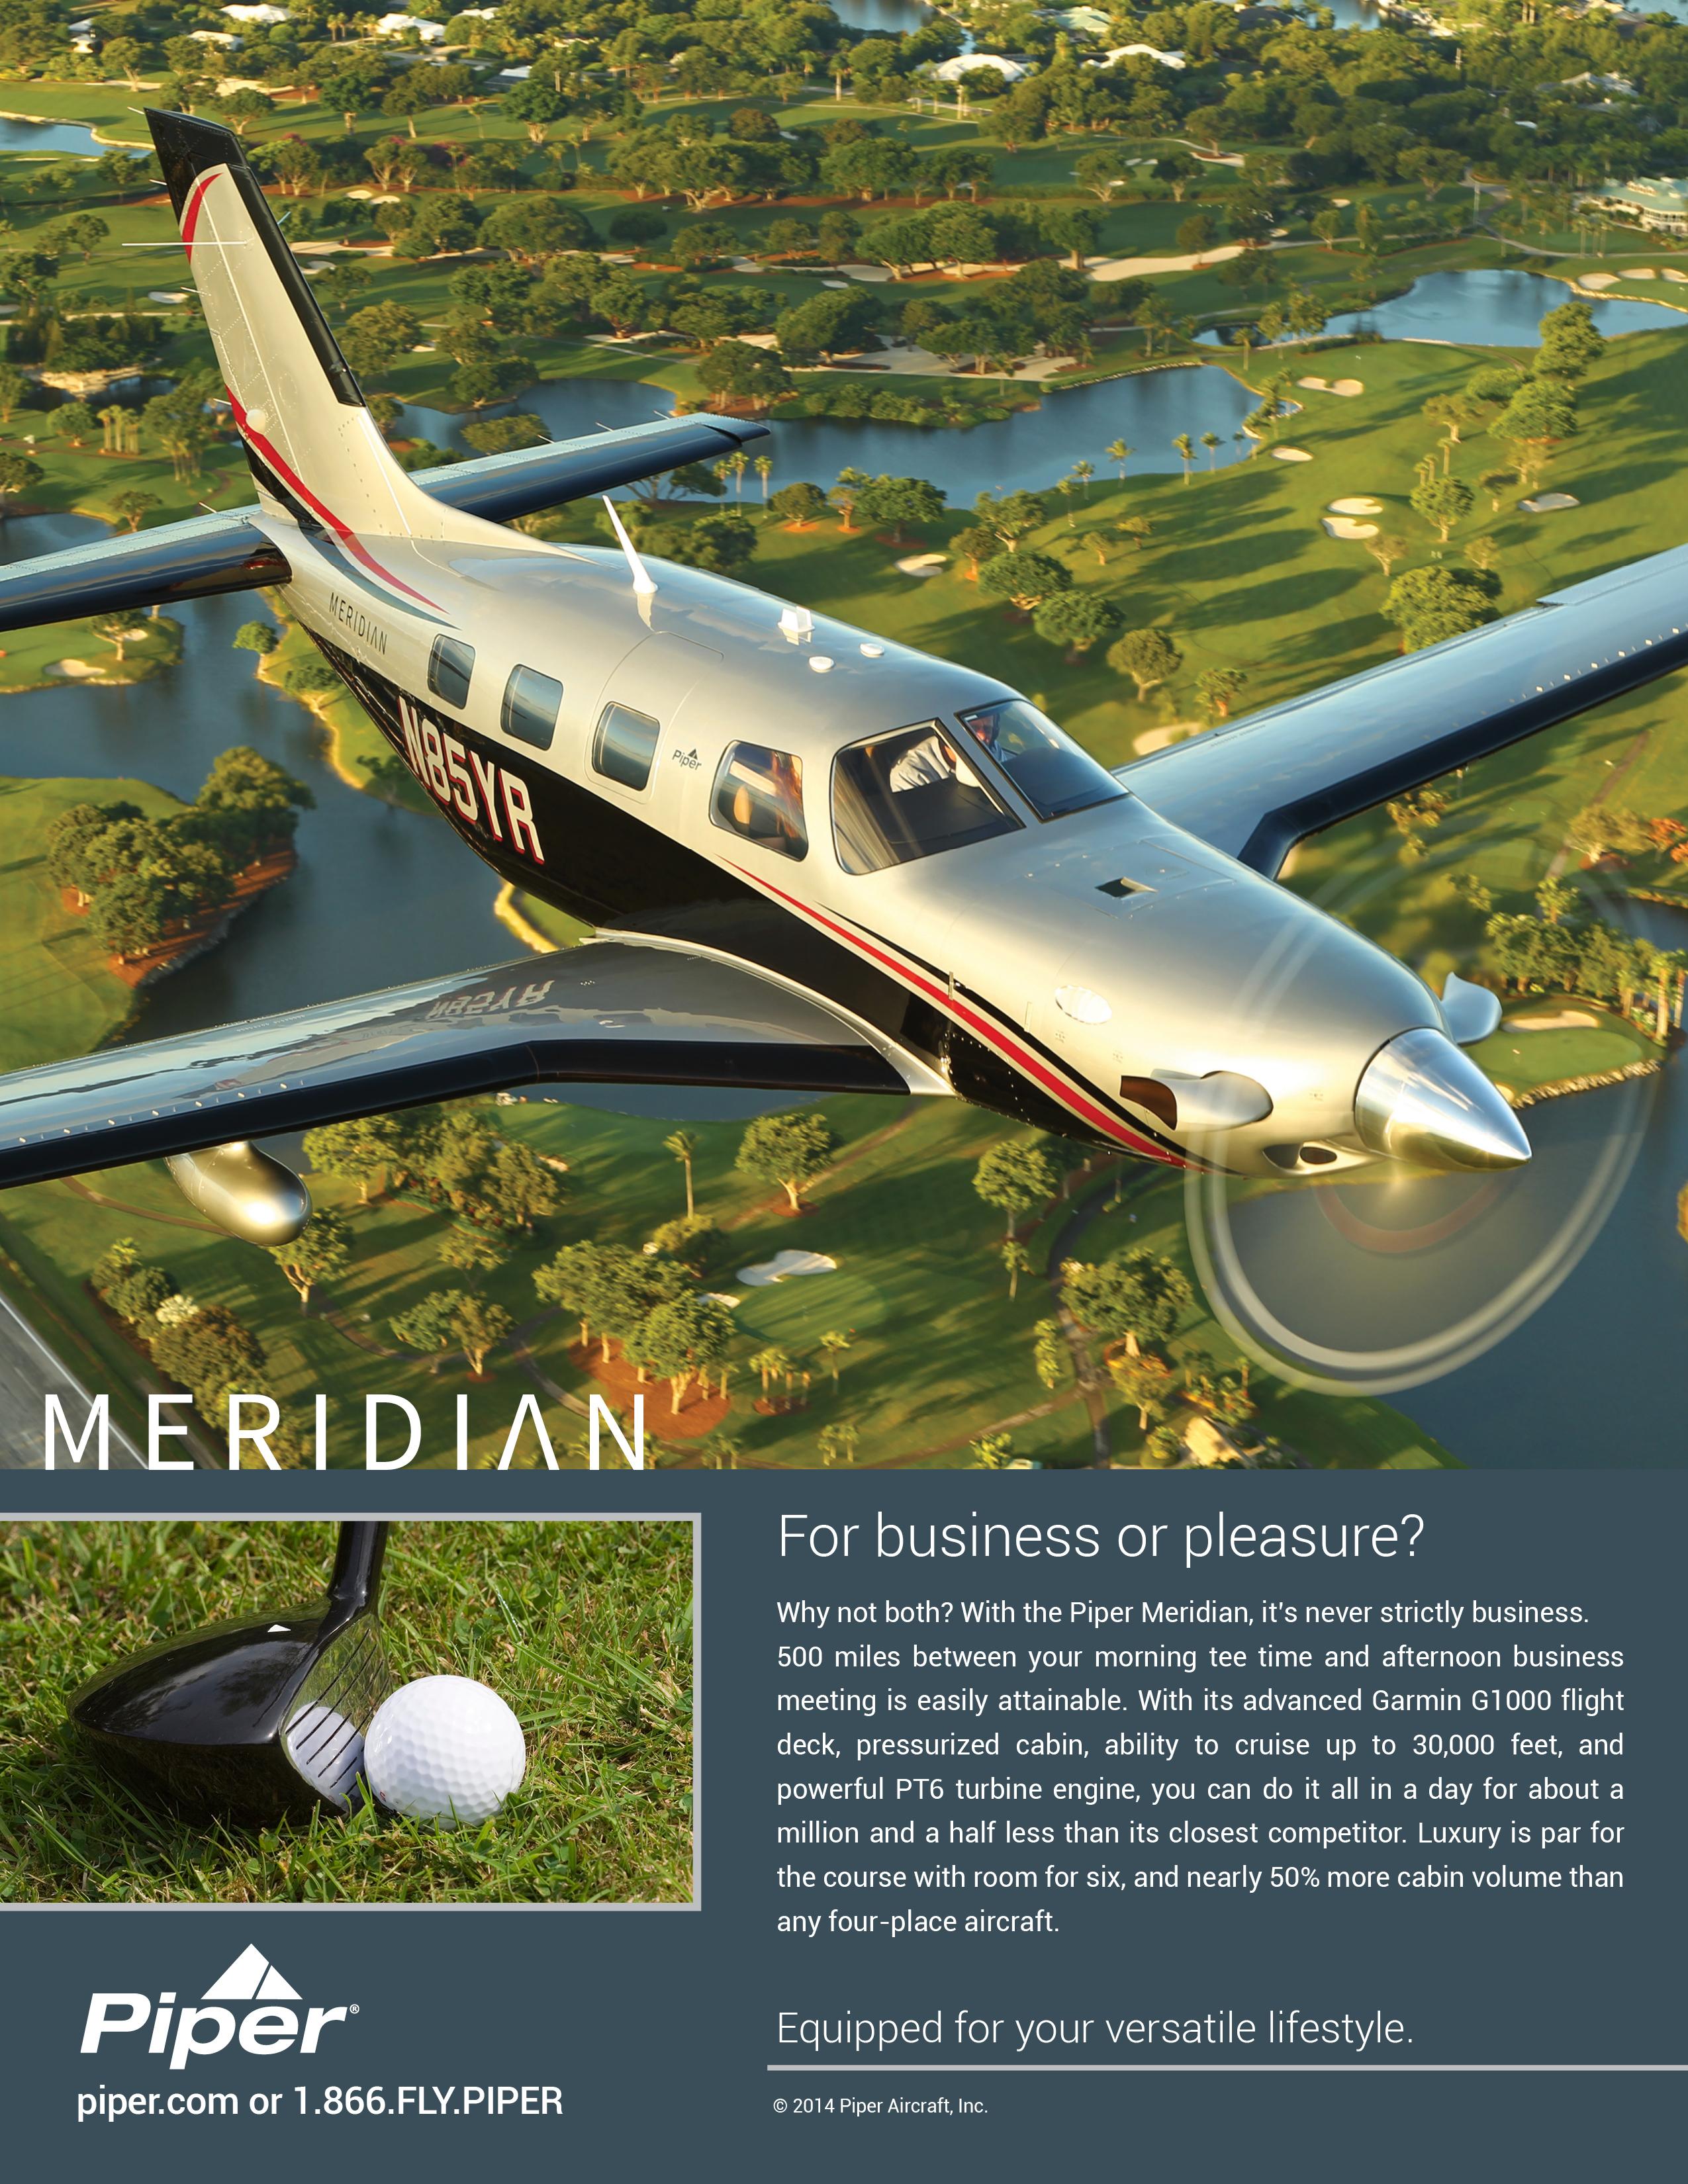 2014 Piper Meridian Ad